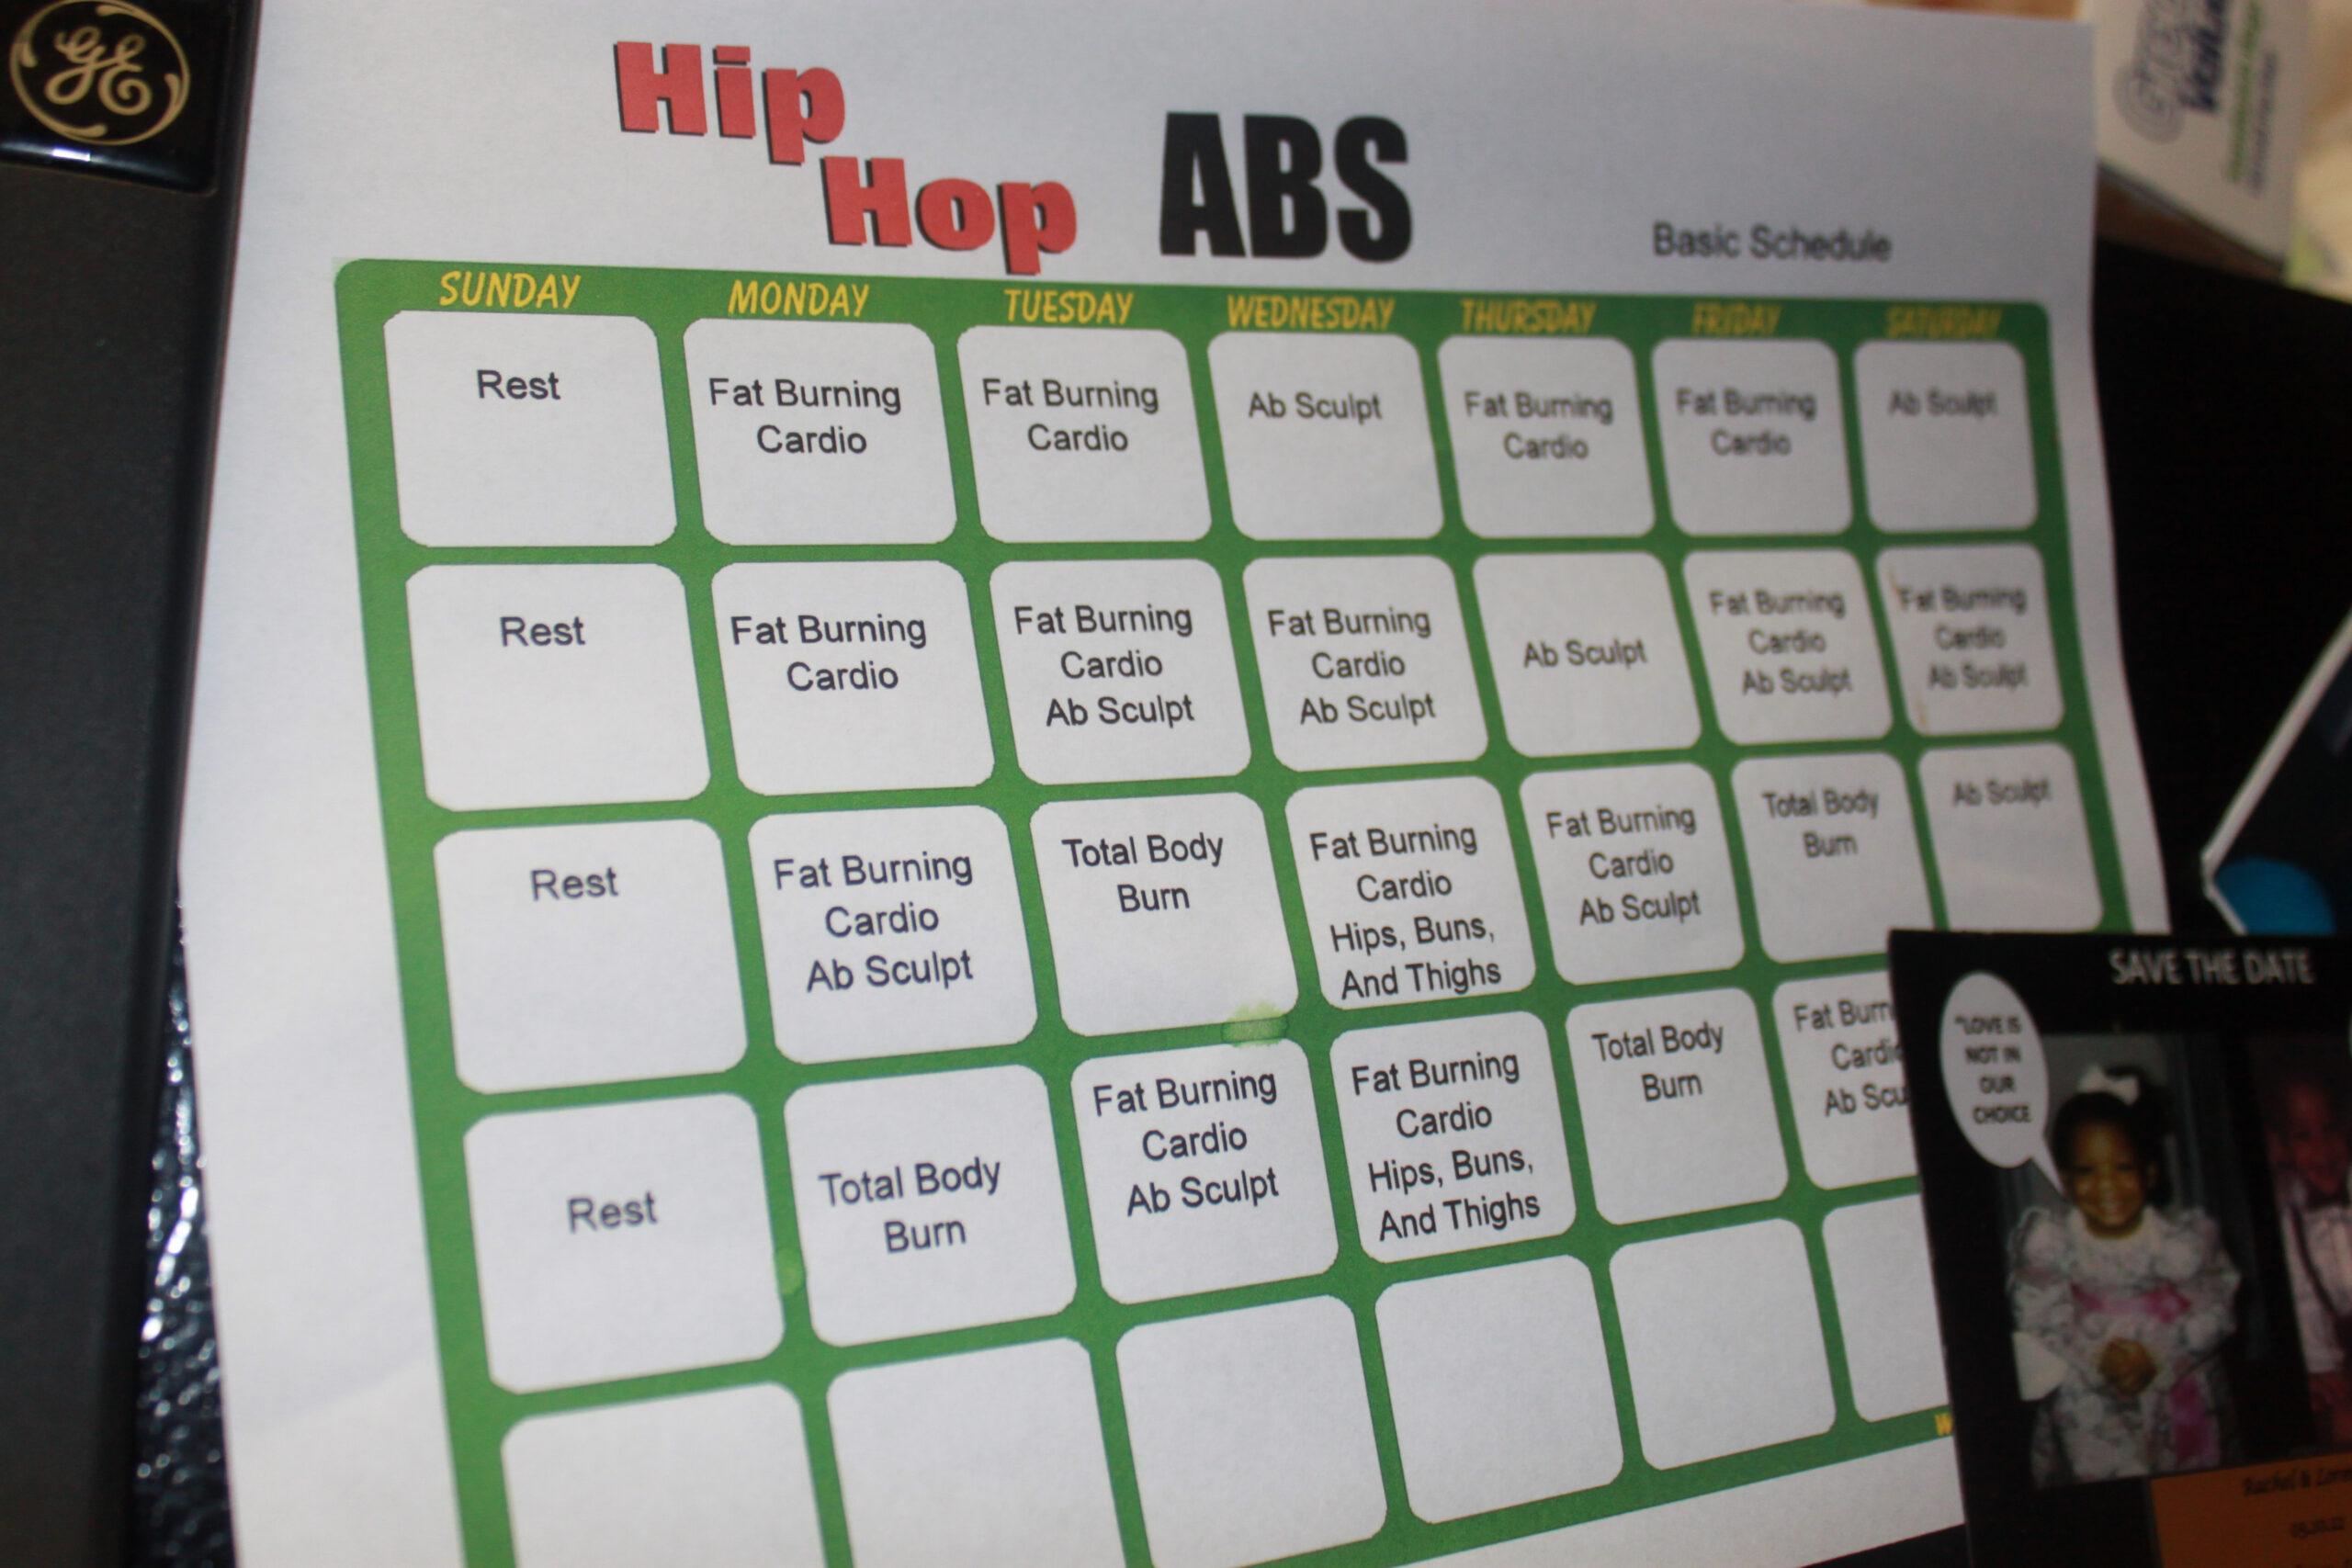 Hip Hop Abs Calendar | Calendar For Planning with regard to Hip Hop Abs Schedule